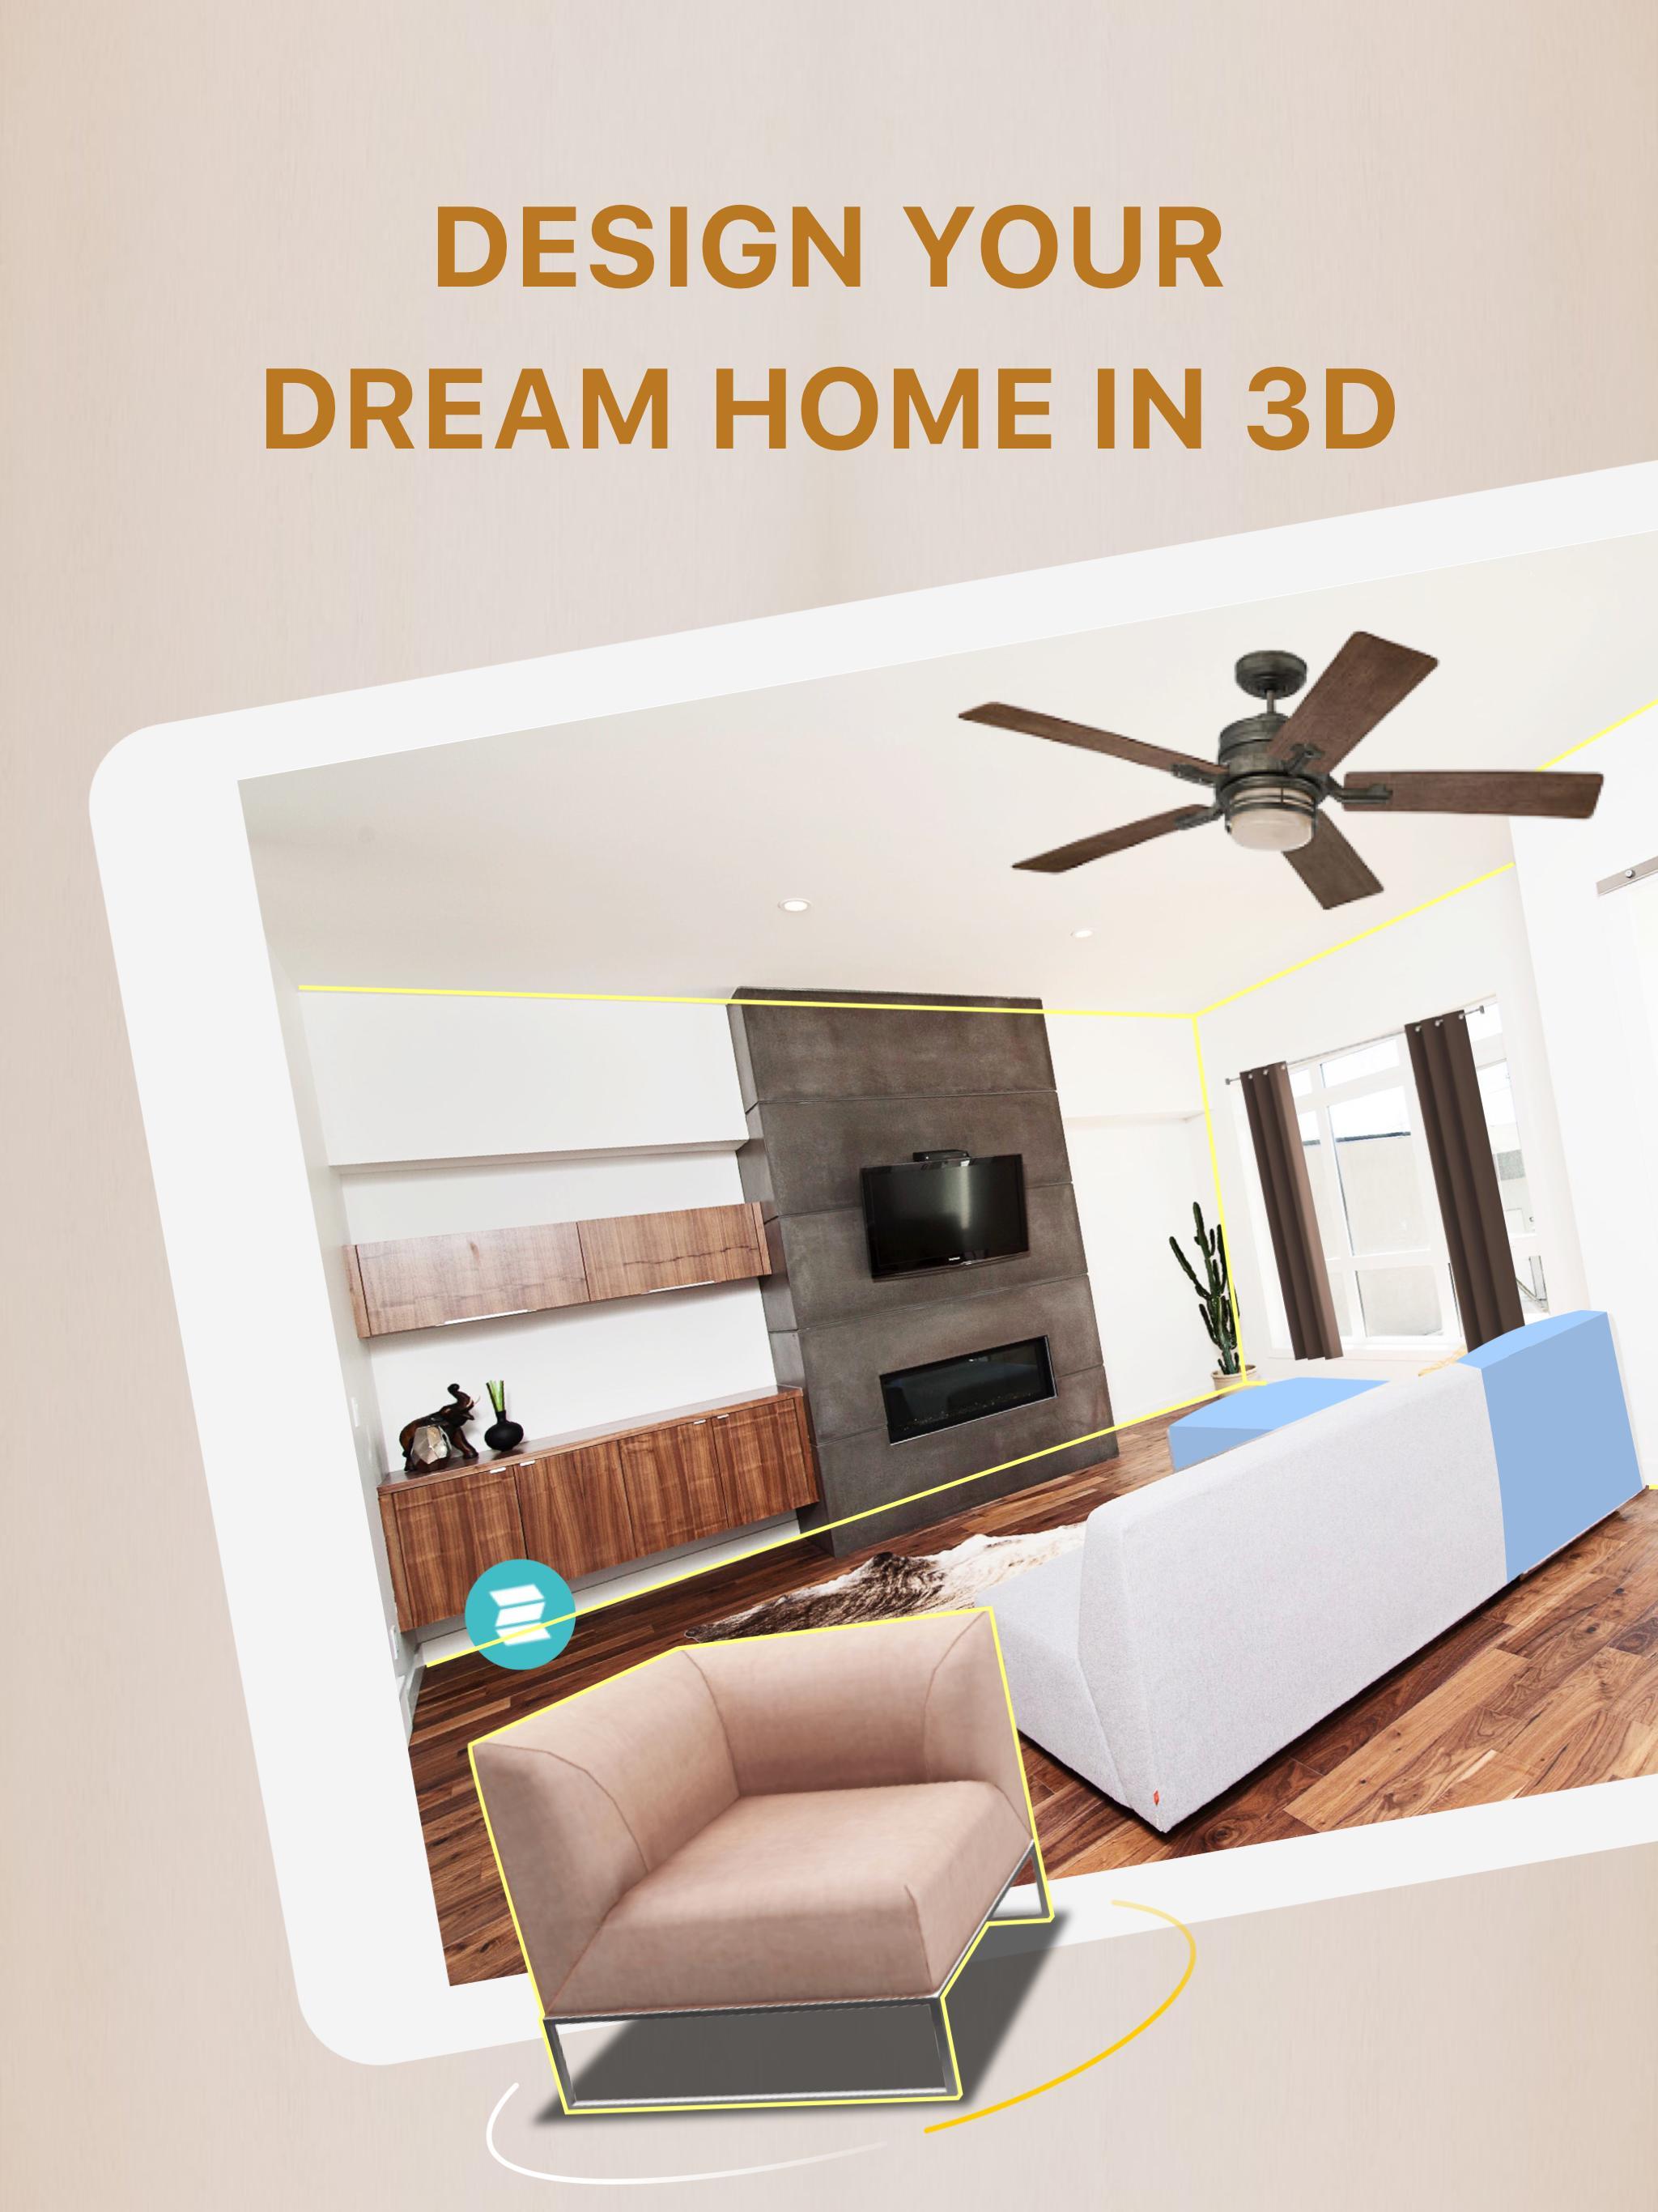 homestyler interior design for windows 10 pro